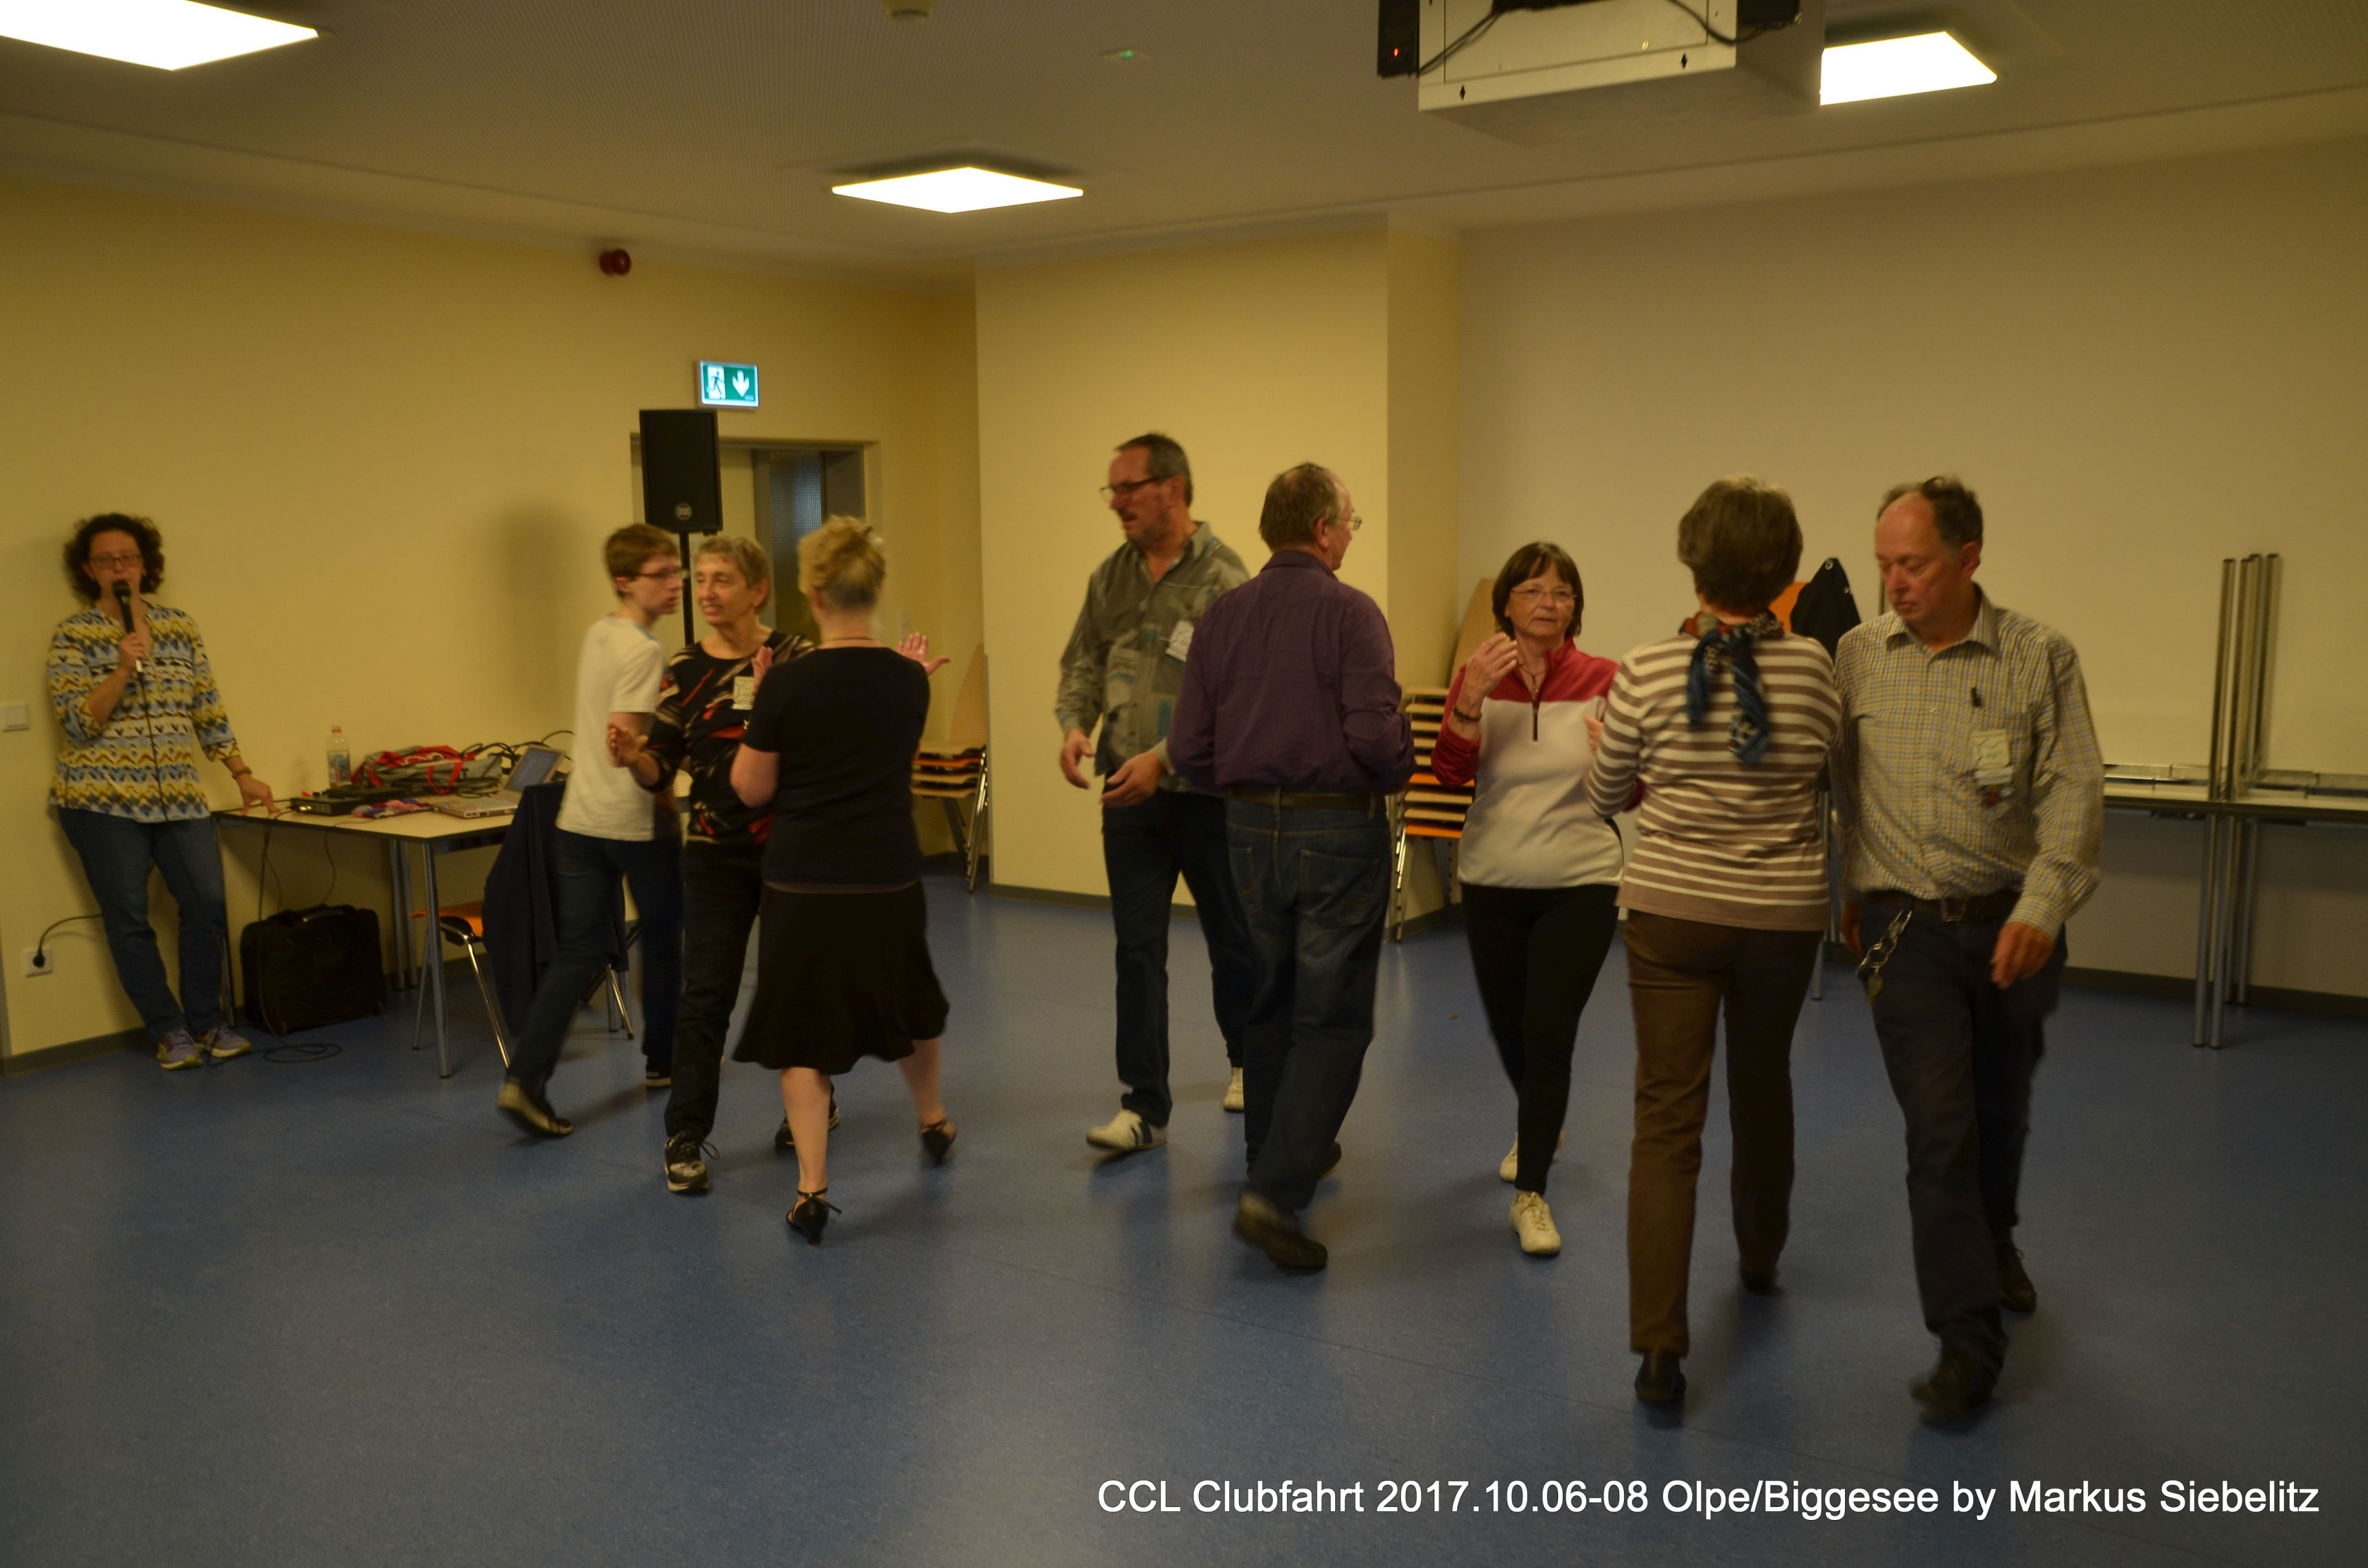 CCL Clubfahrt 2017.10.06-08 Biggesee (2)